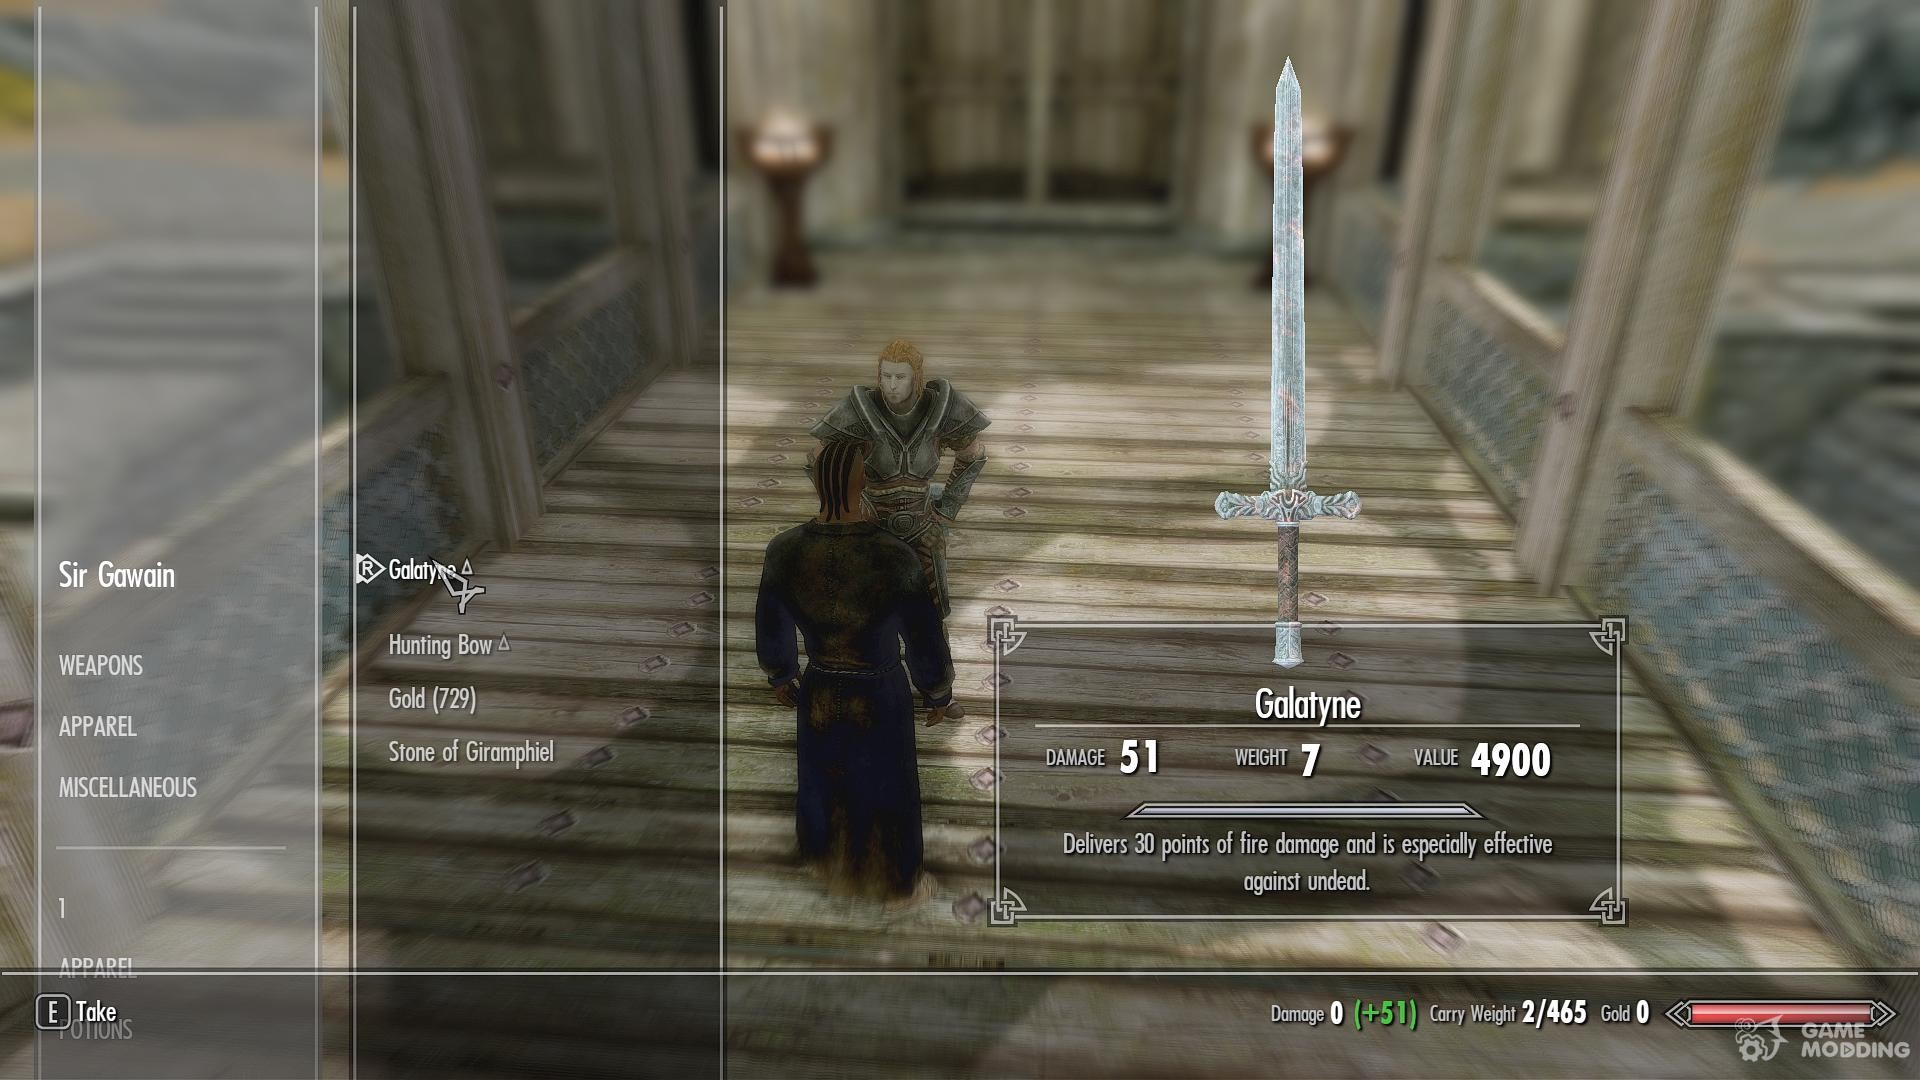 Sir Gawain Follower Mod for TES V: Skyrim